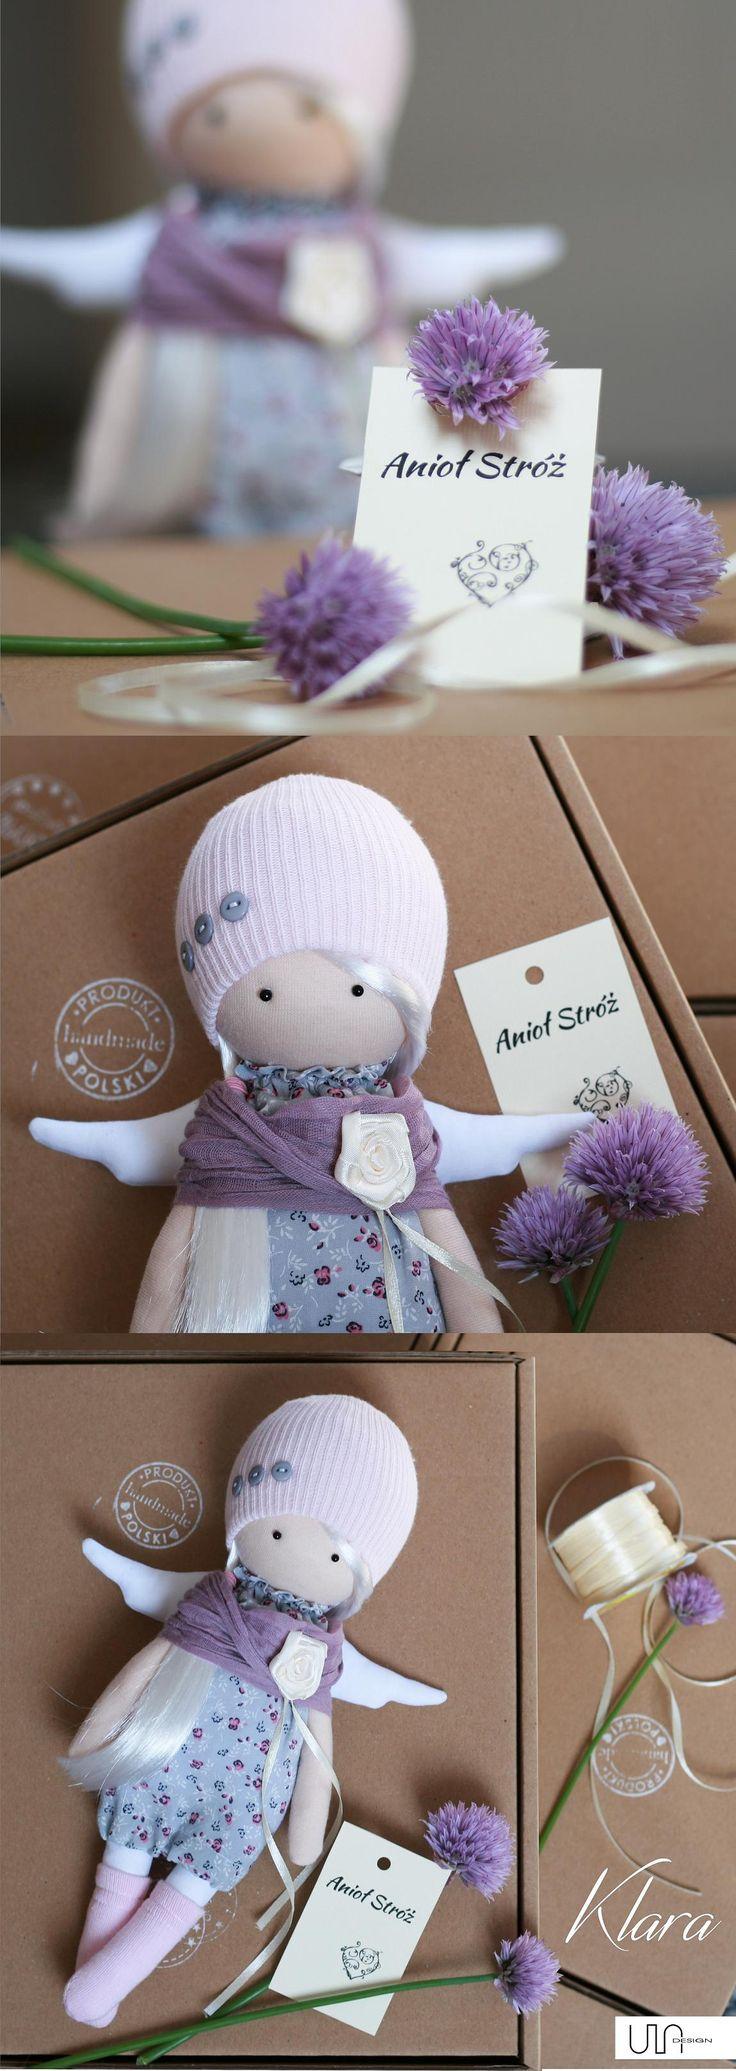 Klara mały aniołek stróż